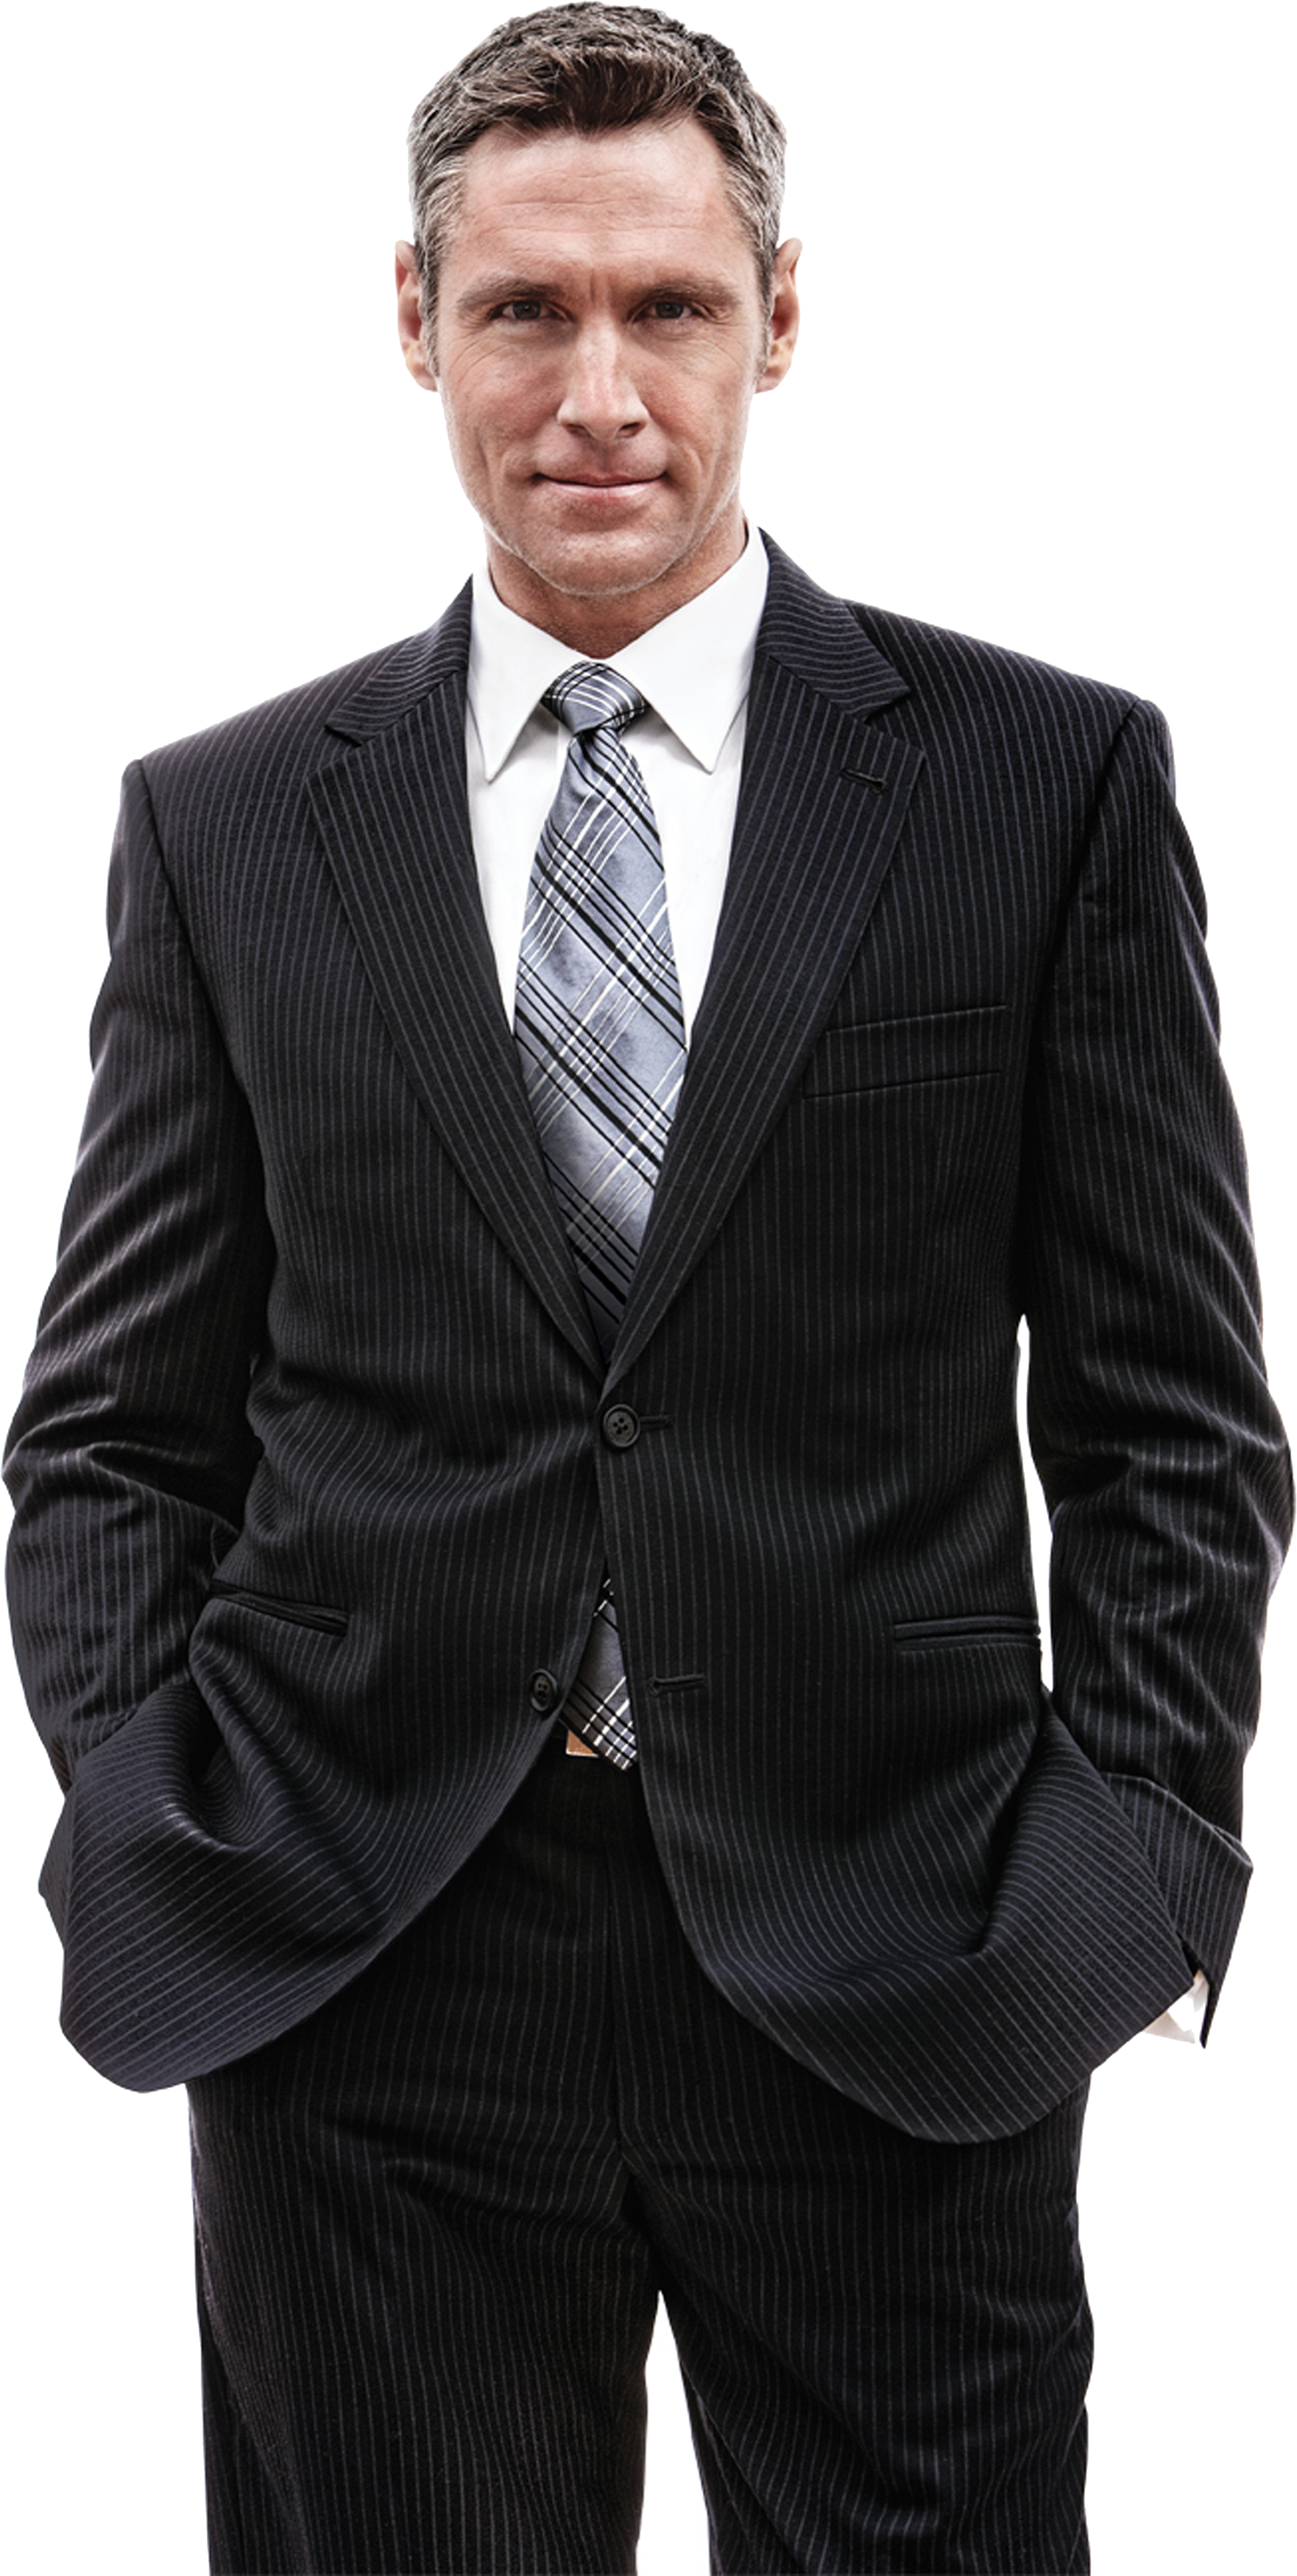 Businessman PNG - 5652